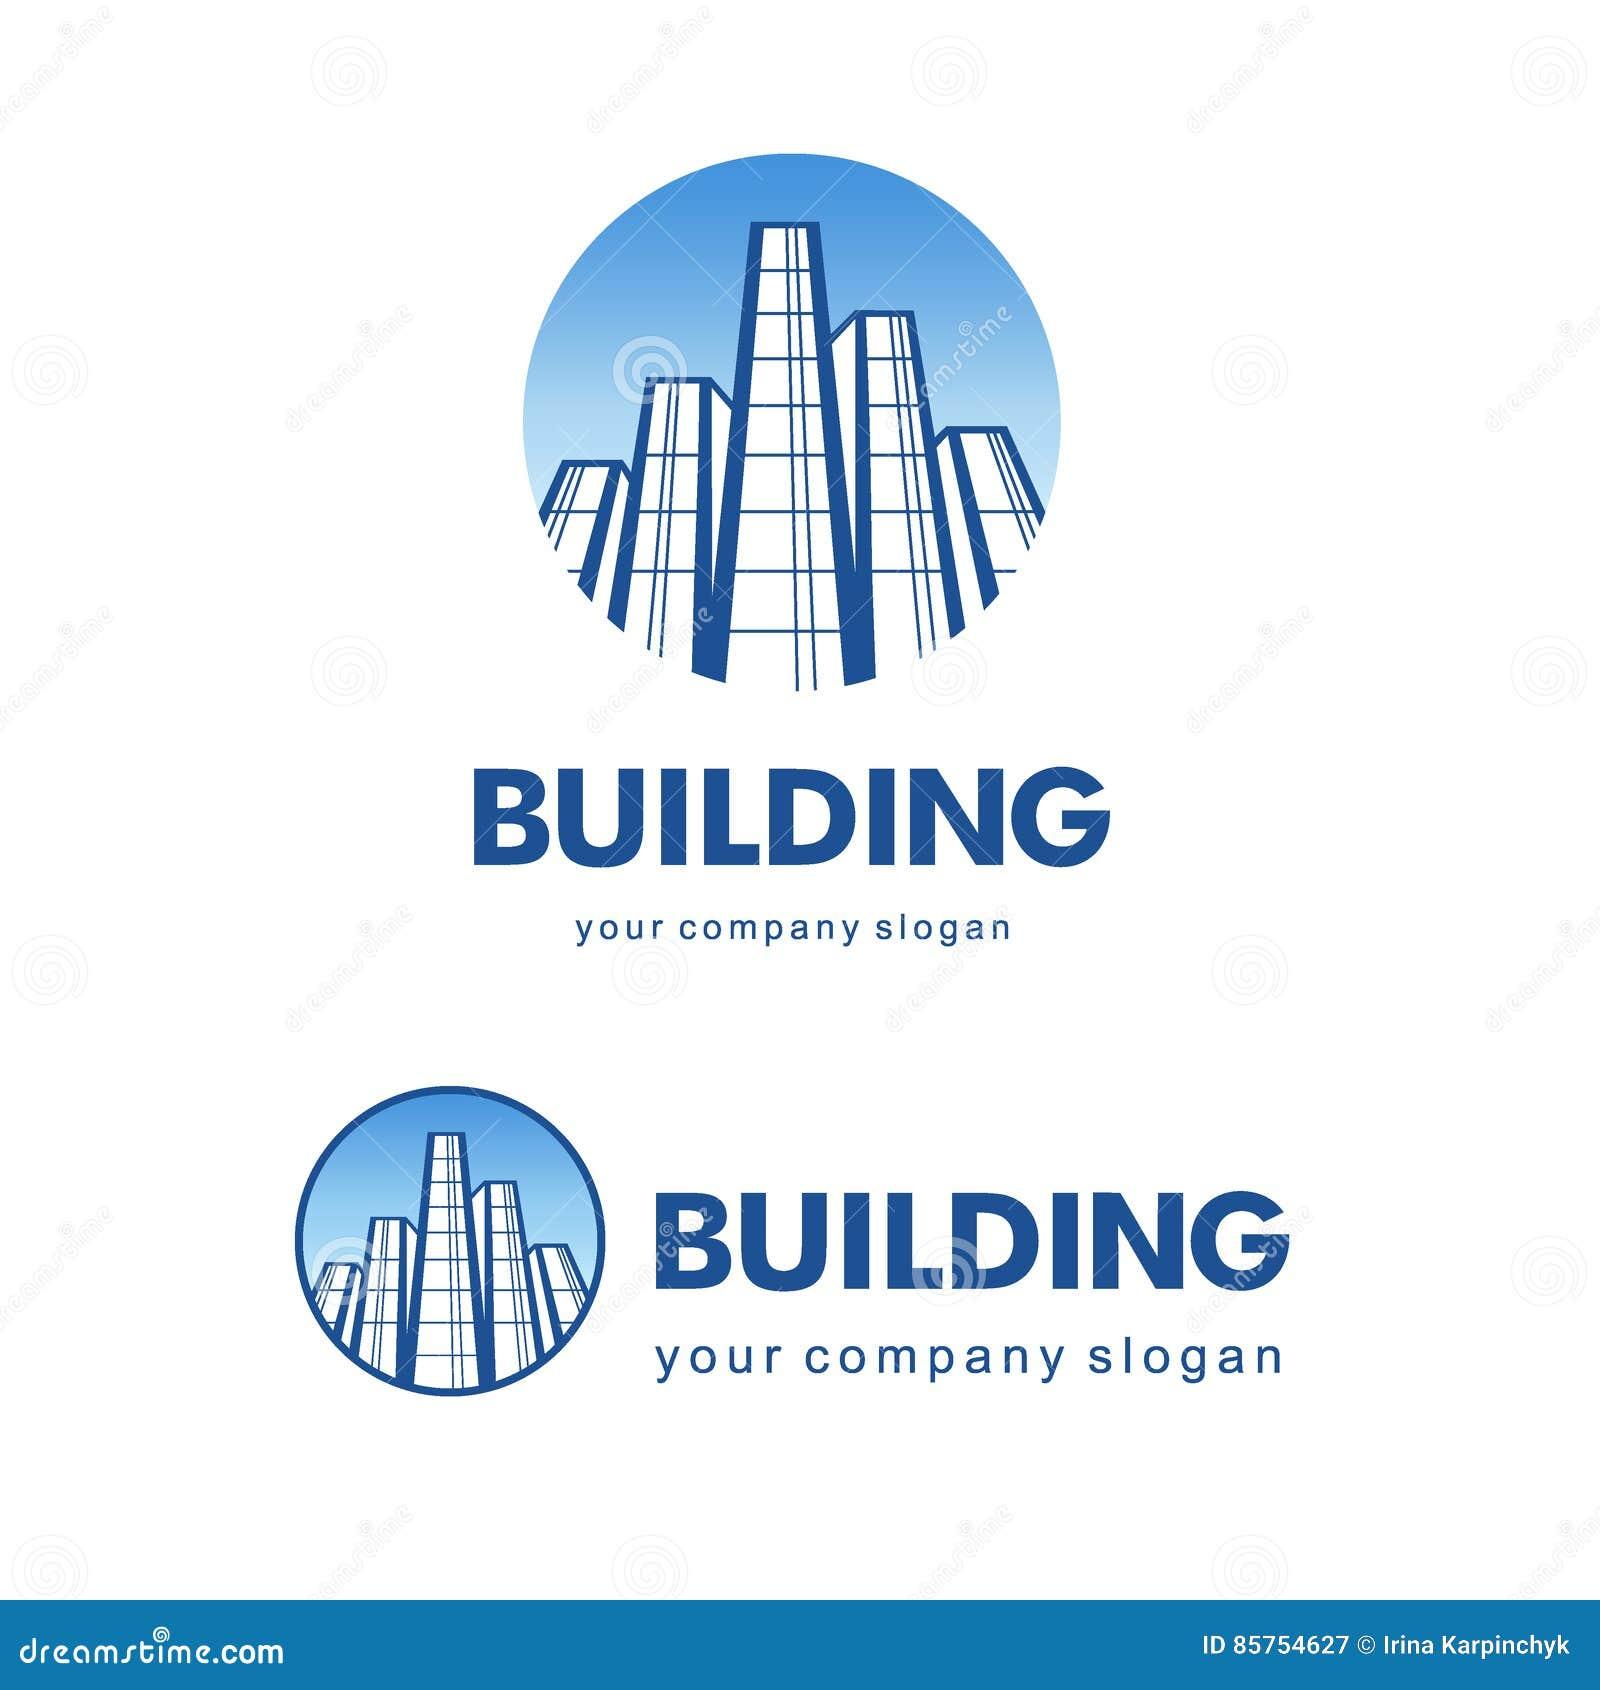 Architect Company Architect Construction Conceptvector Logo For Building Companies